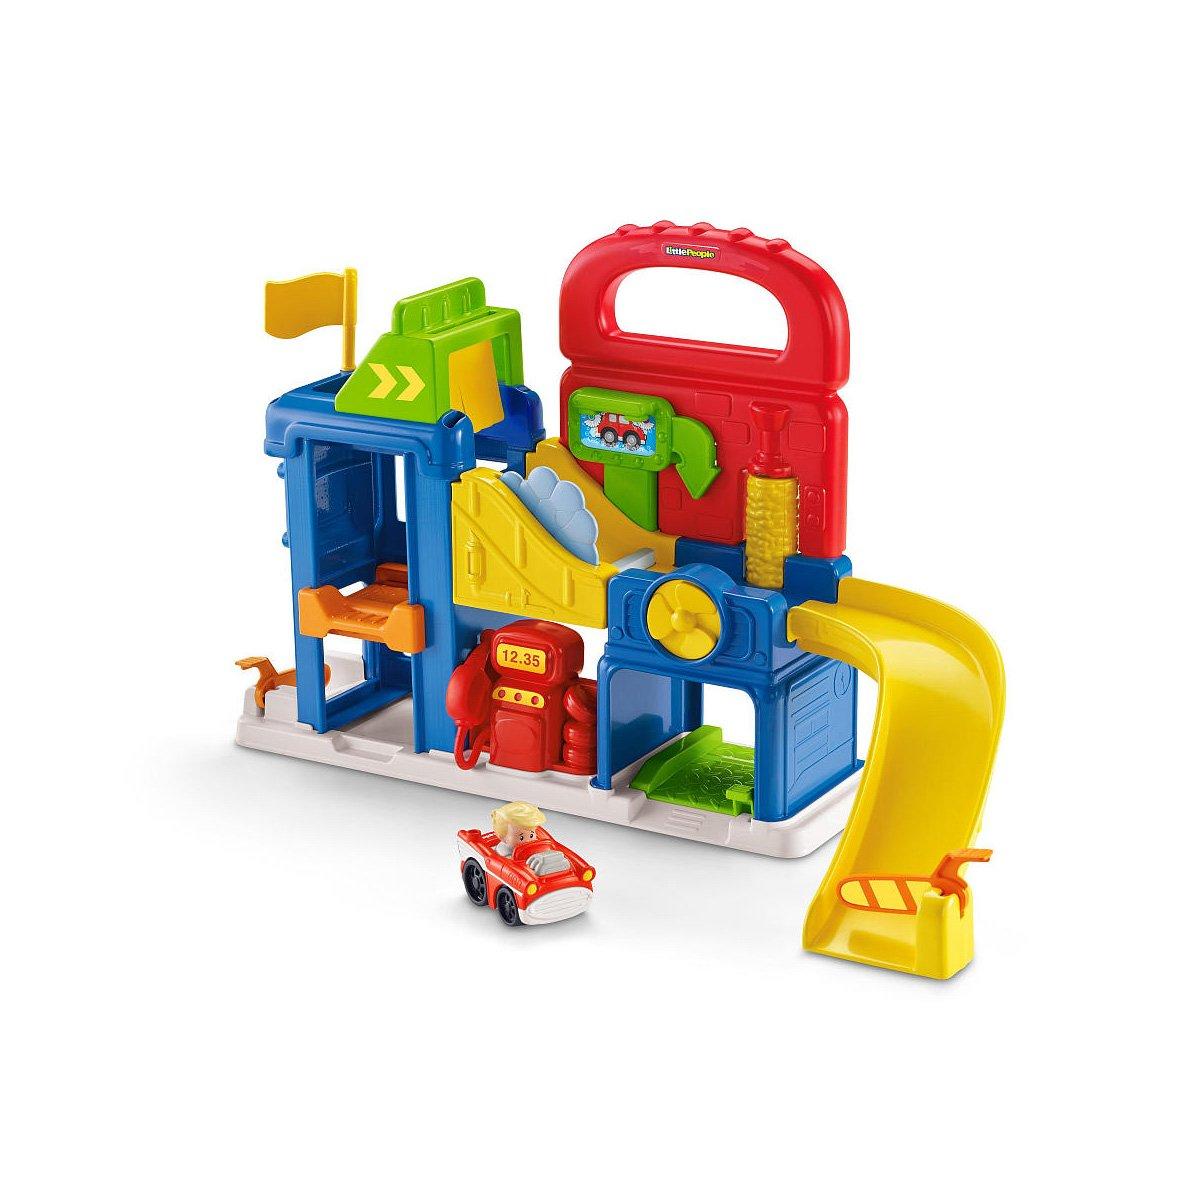 Little people wheelies garage sears com mx me entiende for Garage a persan